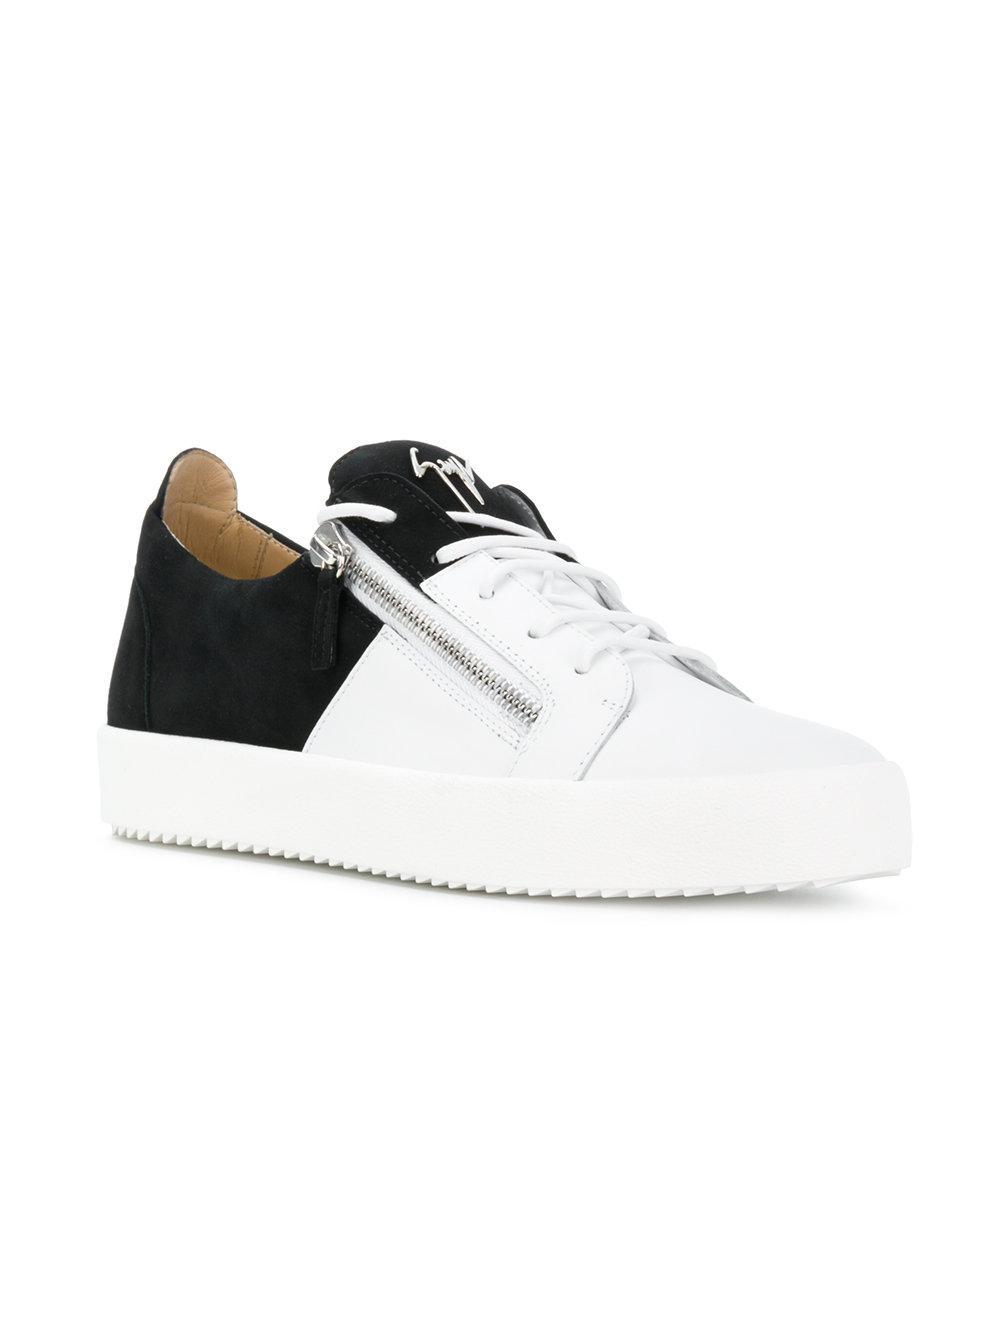 e7608341670 Lyst - Giuseppe Zanotti Bicolour May London Sneakers in White for Men -  Save 26%